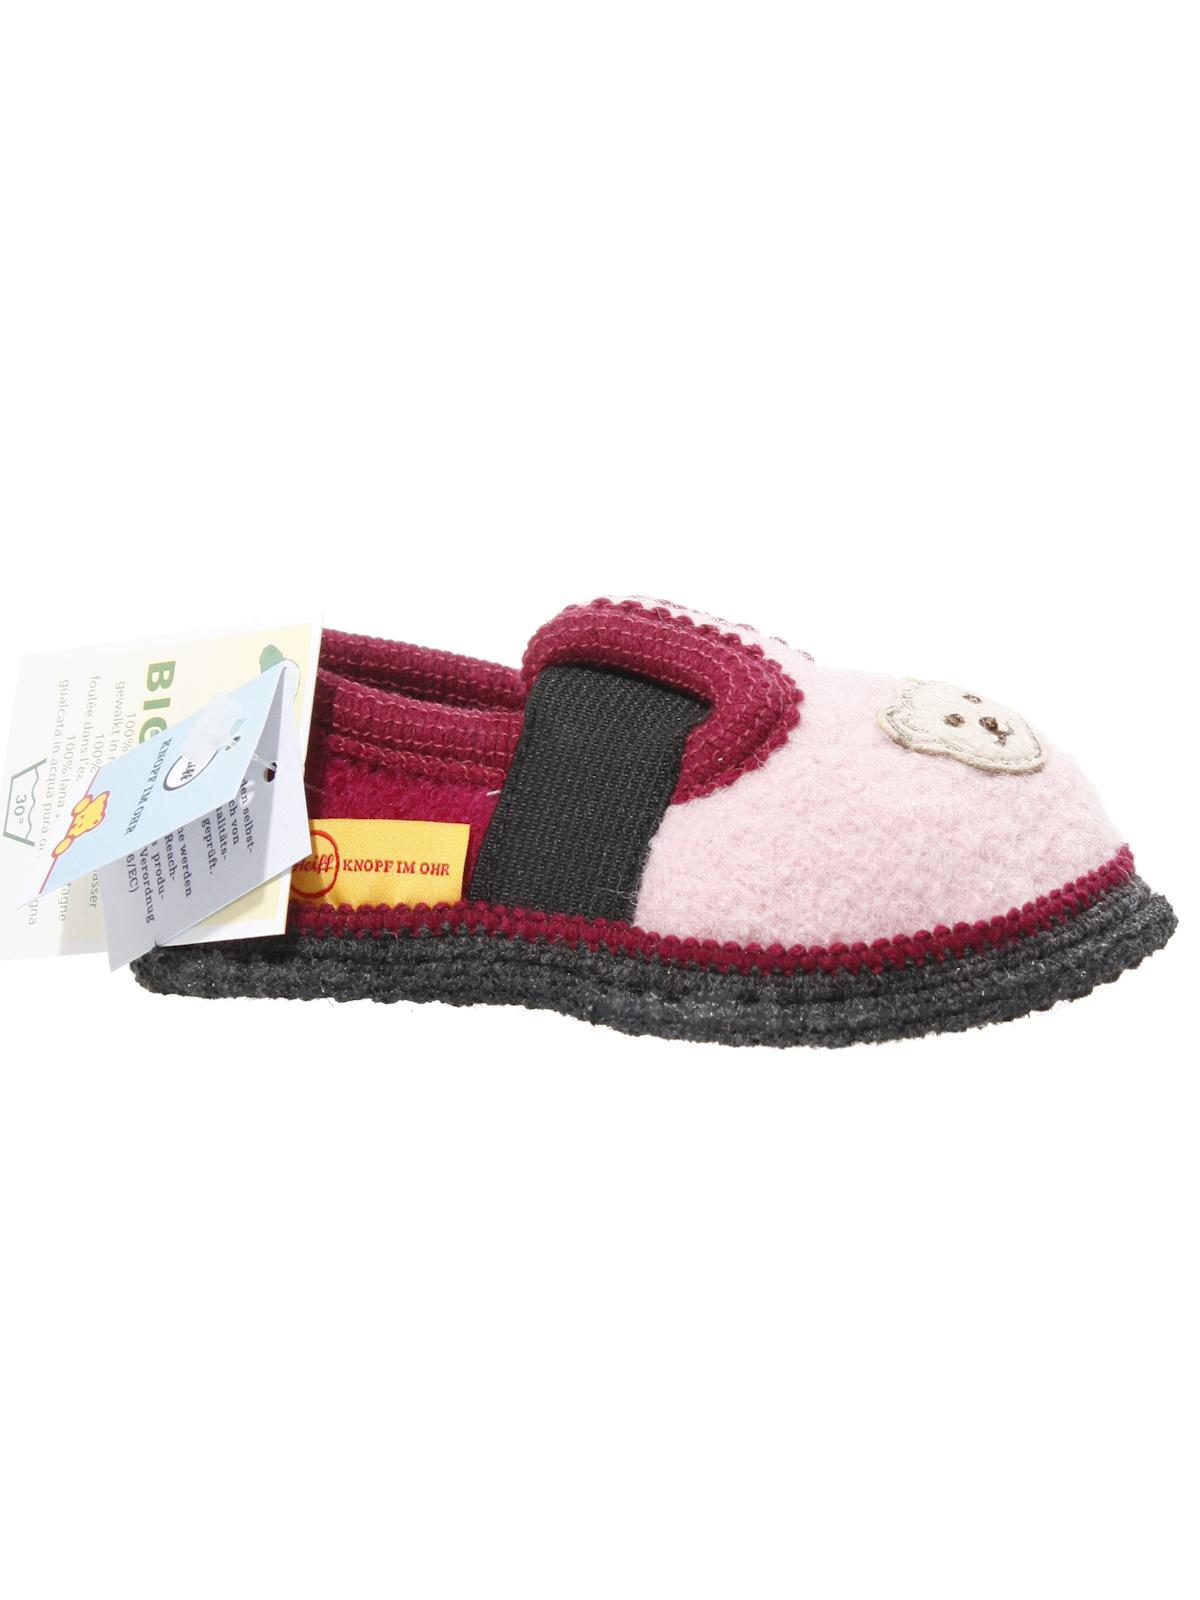 finest selection c02e7 60d18 Steiff Knopf im Ohr Schuhe - Hausschuhe für Kinder